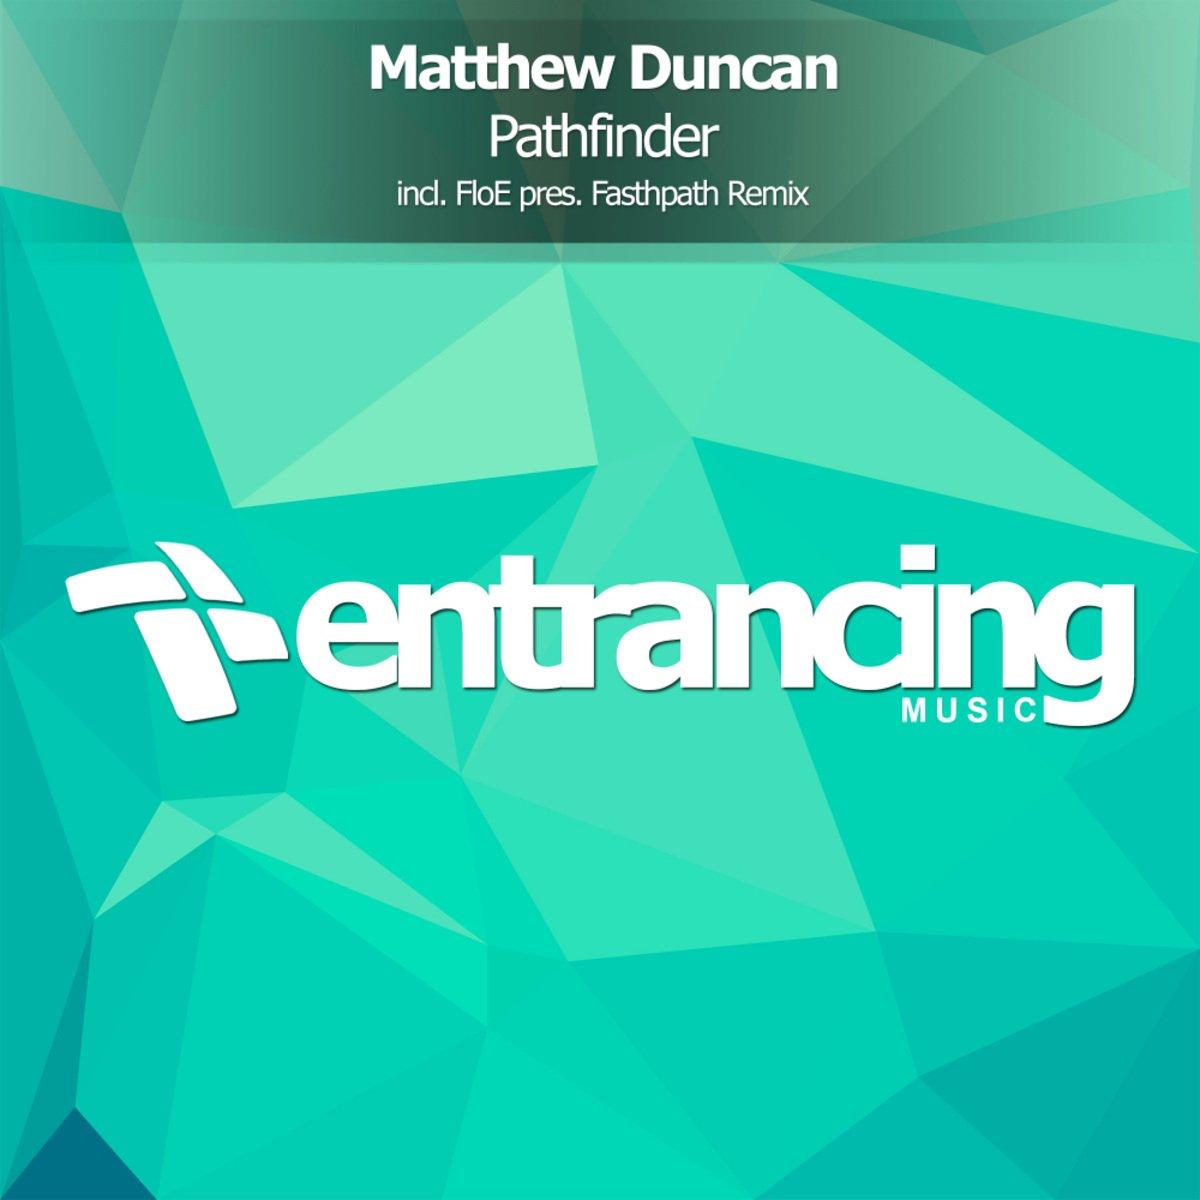 On Air Last Sunlight - Binaural Session 040 on @AfterhoursFM   04. Matthew Duncan - Pathfinder (Original Mix) @entrancingmusic #TranceFamily